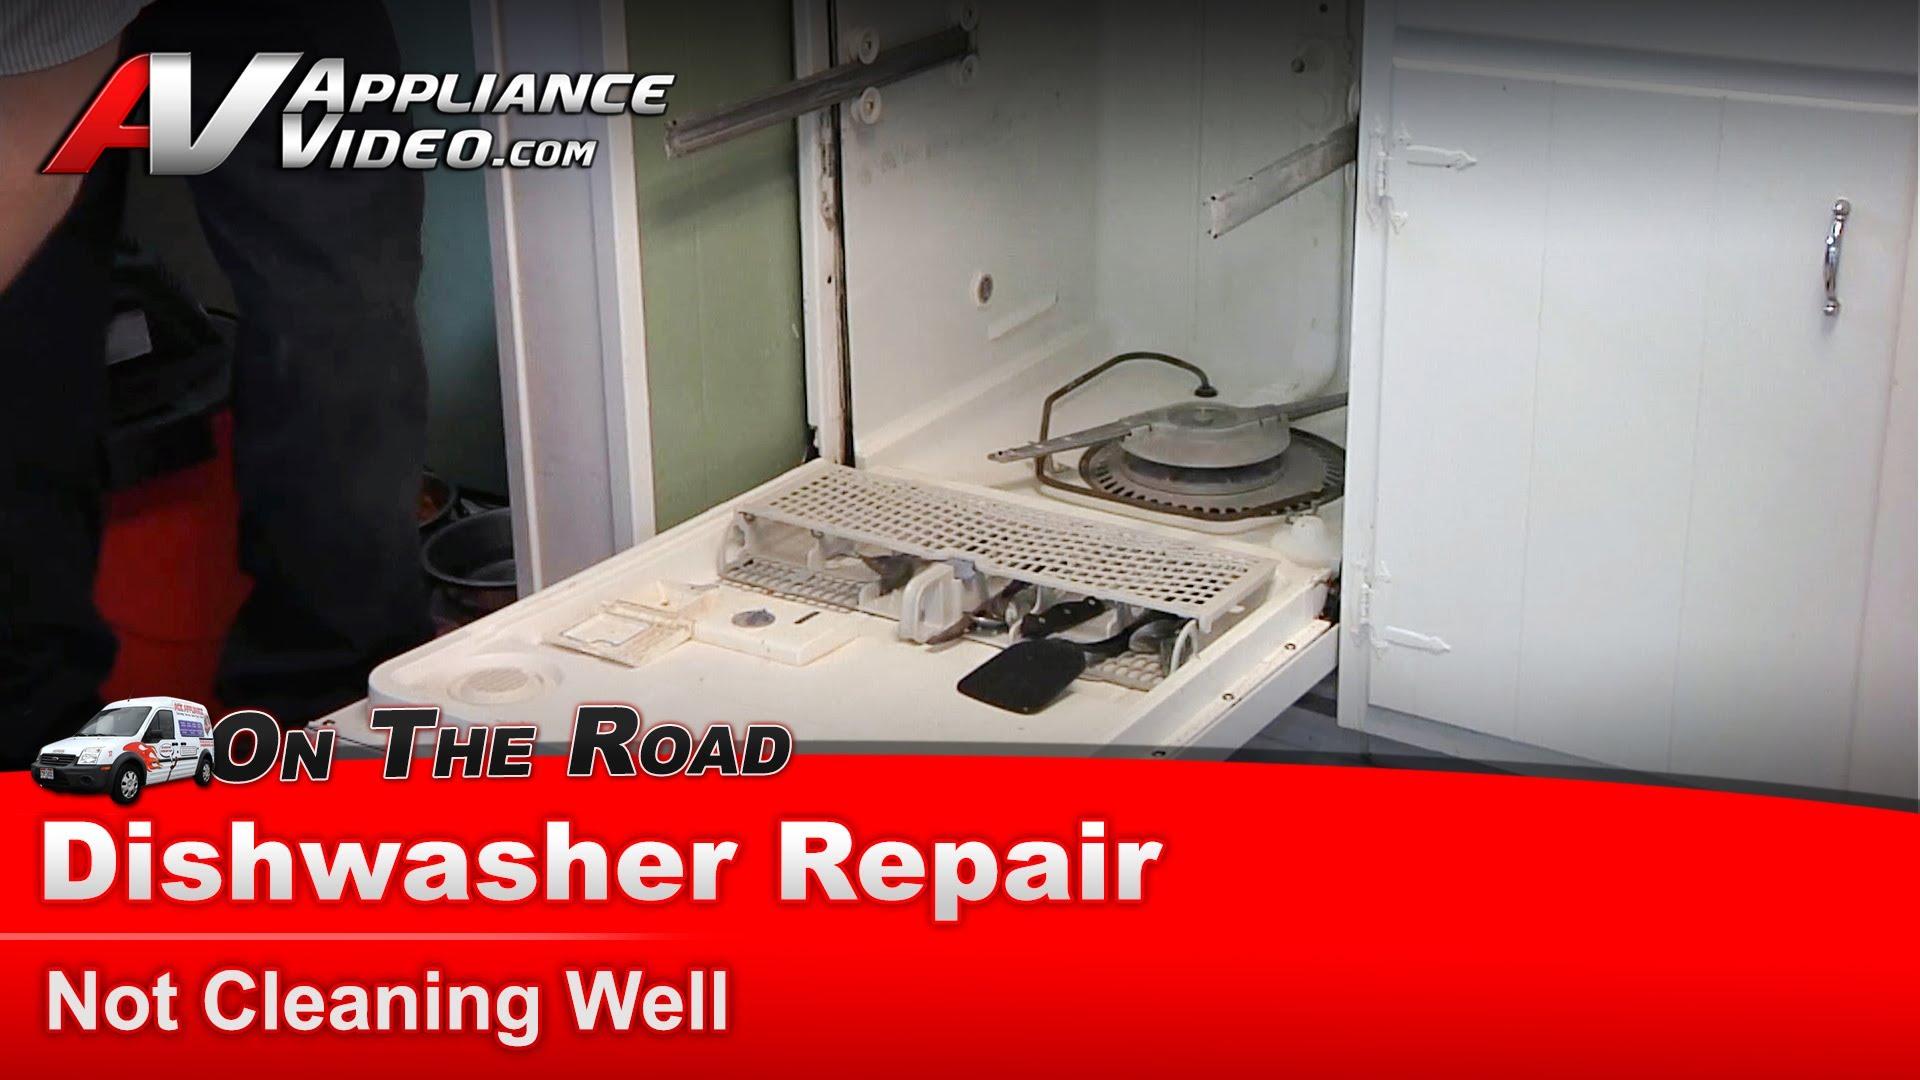 How To Repair Dishwasher Whirlpool Du1100xtpq1 Dishwasher Repair Not Cleaning Well